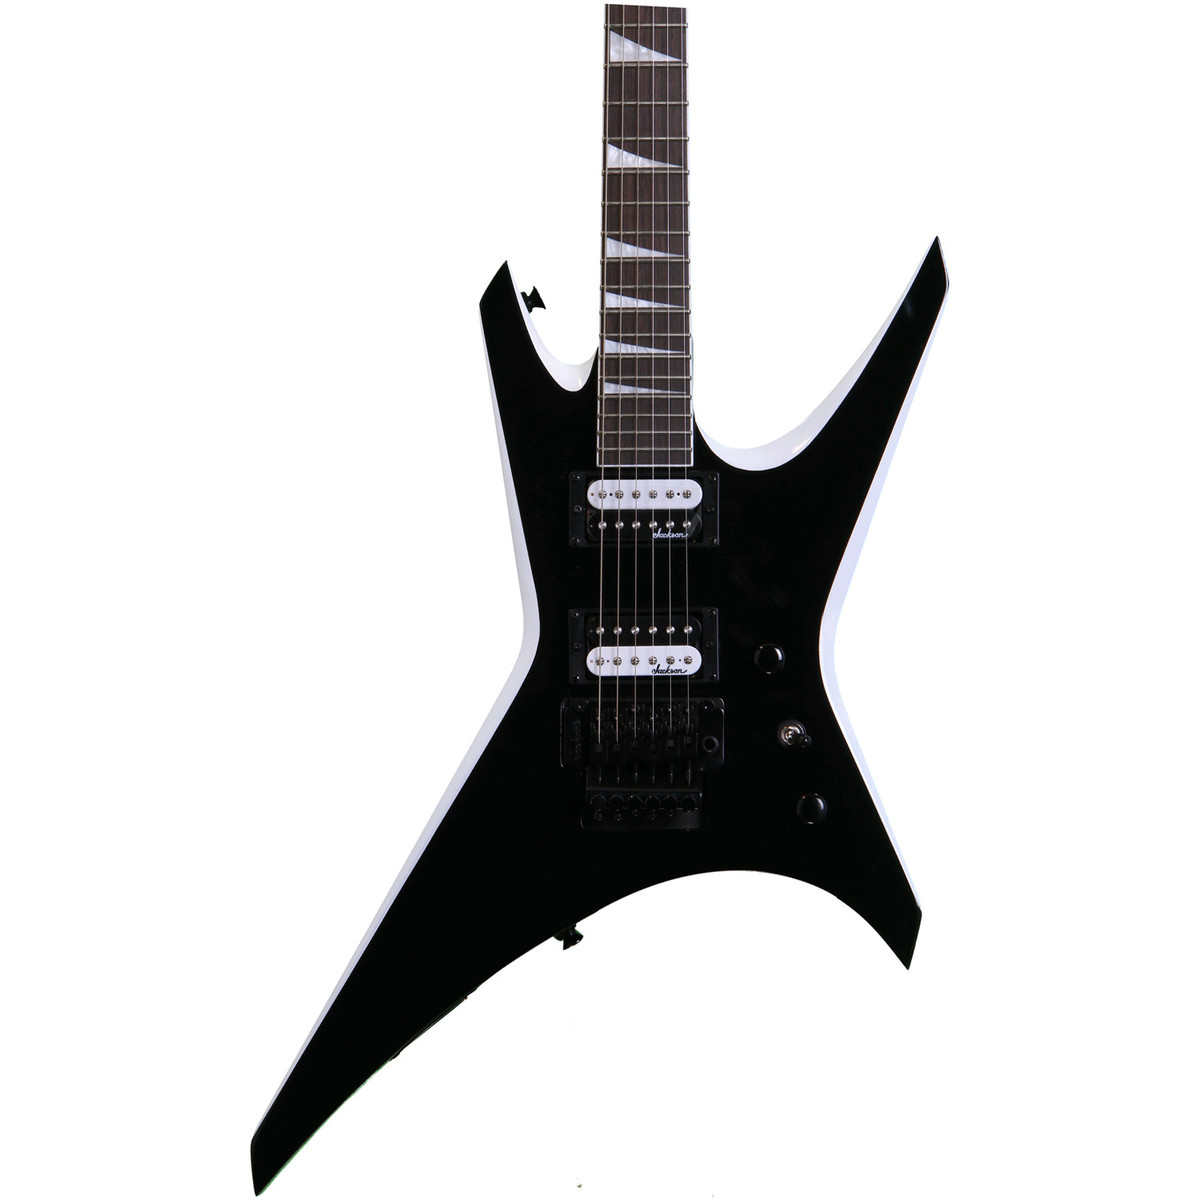 Jackson Js32 Warrior Electric Guitar Black At Gear4music